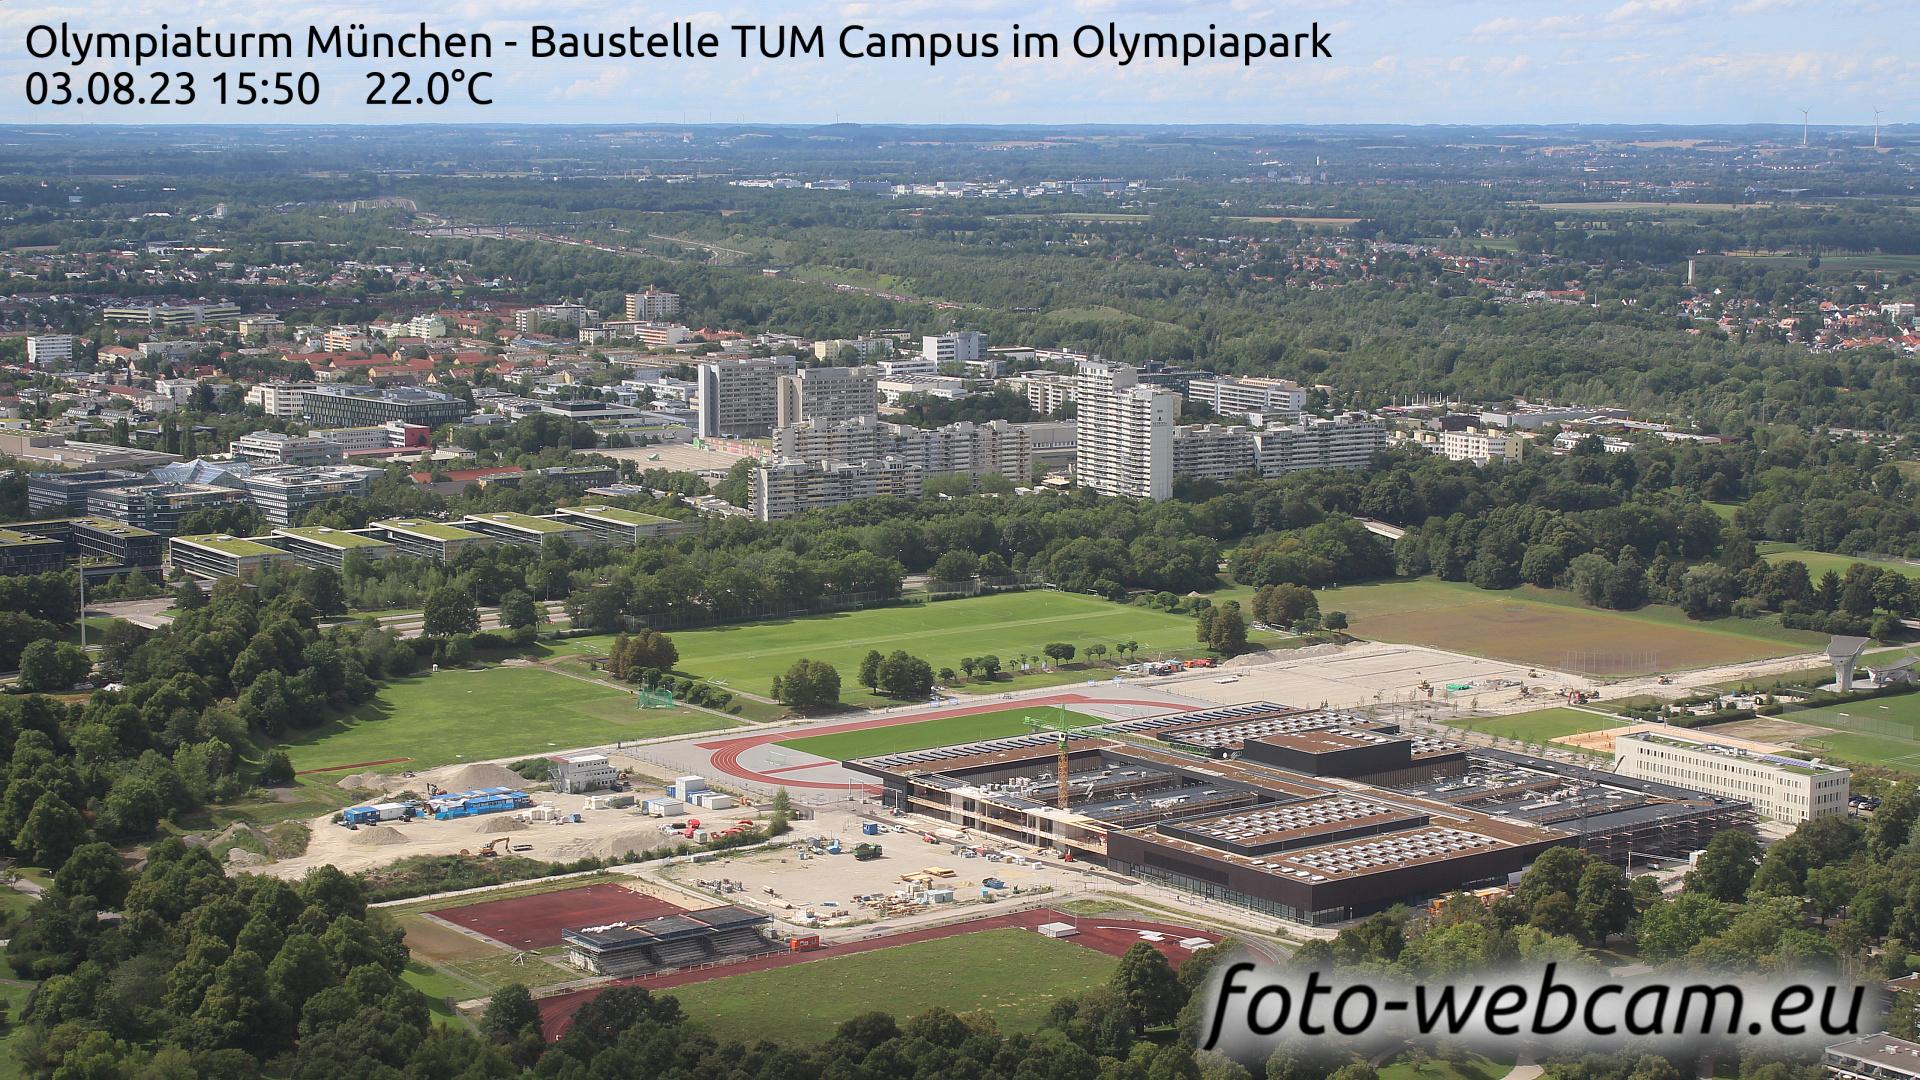 Webcam München Olympiapark